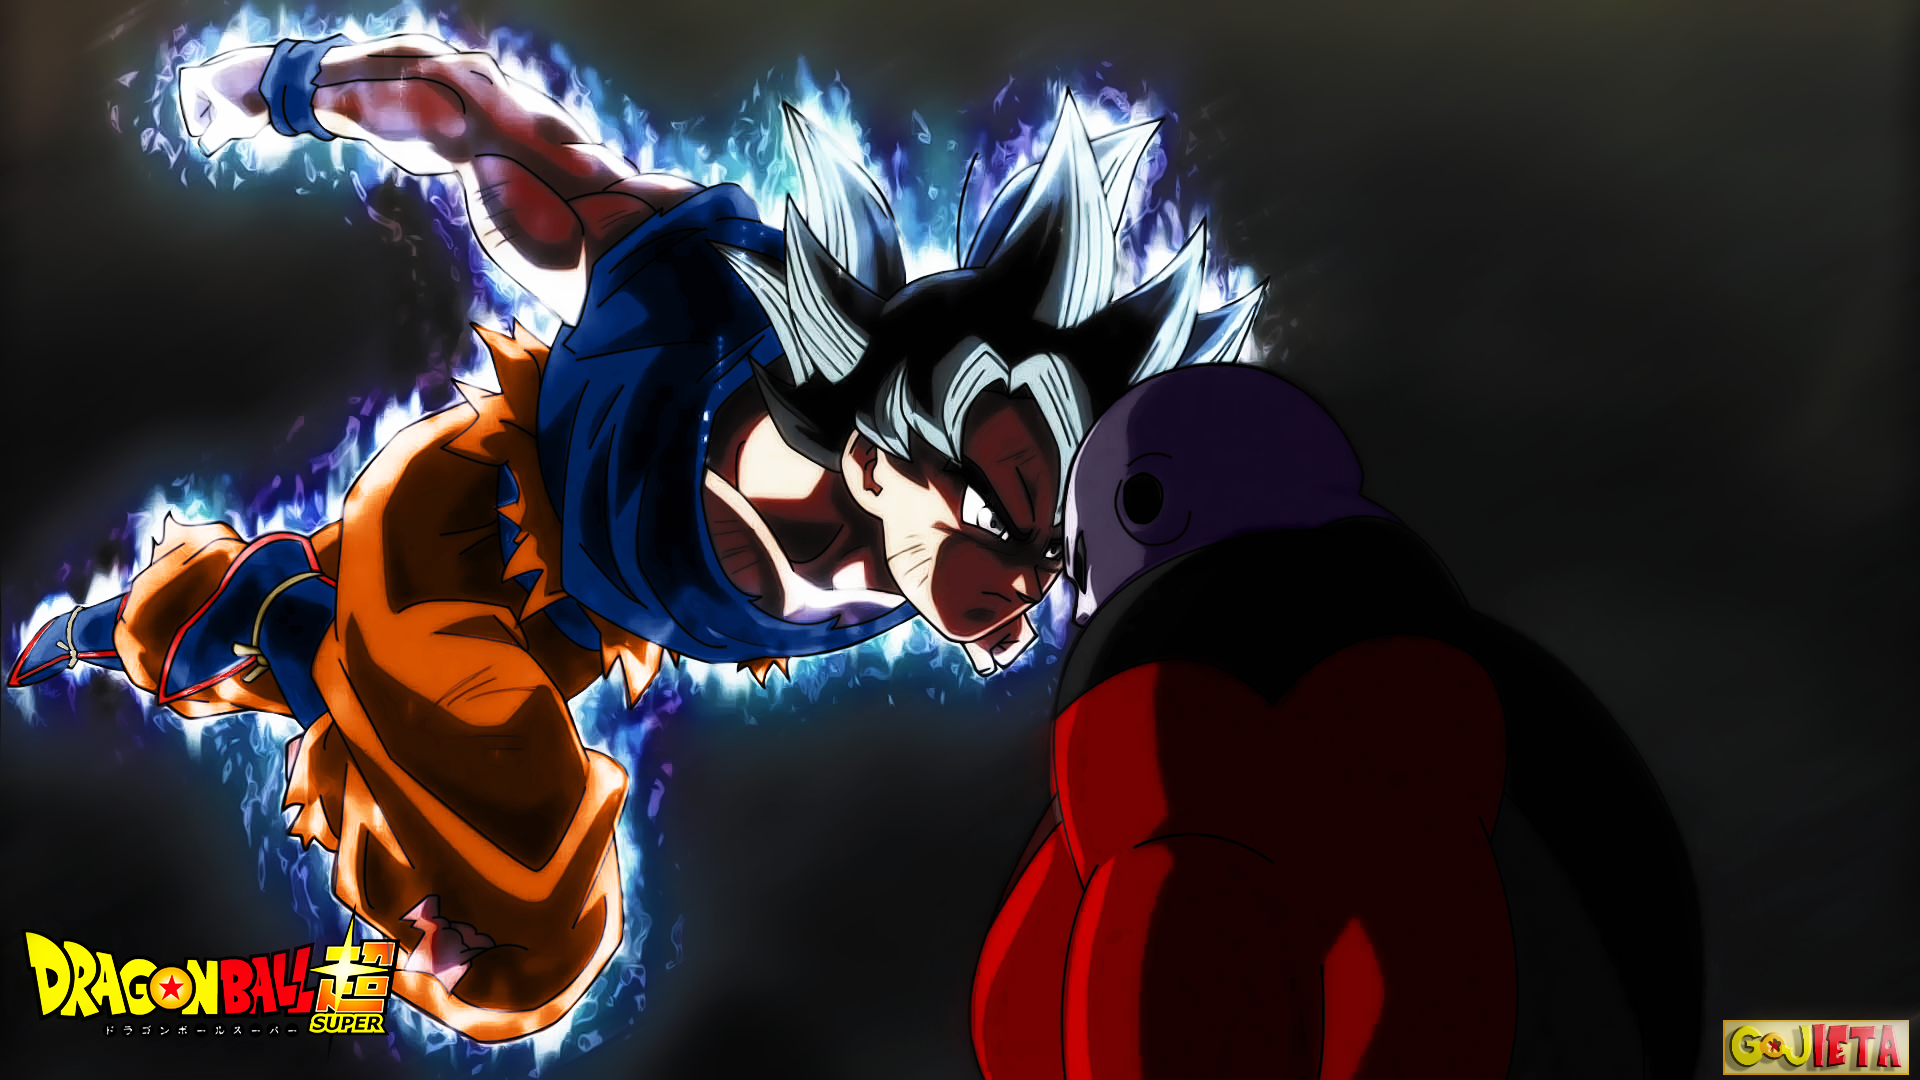 Dragon Ball Super Ultra Instinct Wallpaper: Dragon-Ball-Super Goku-Ultra-Instinct-vs-Jiren By